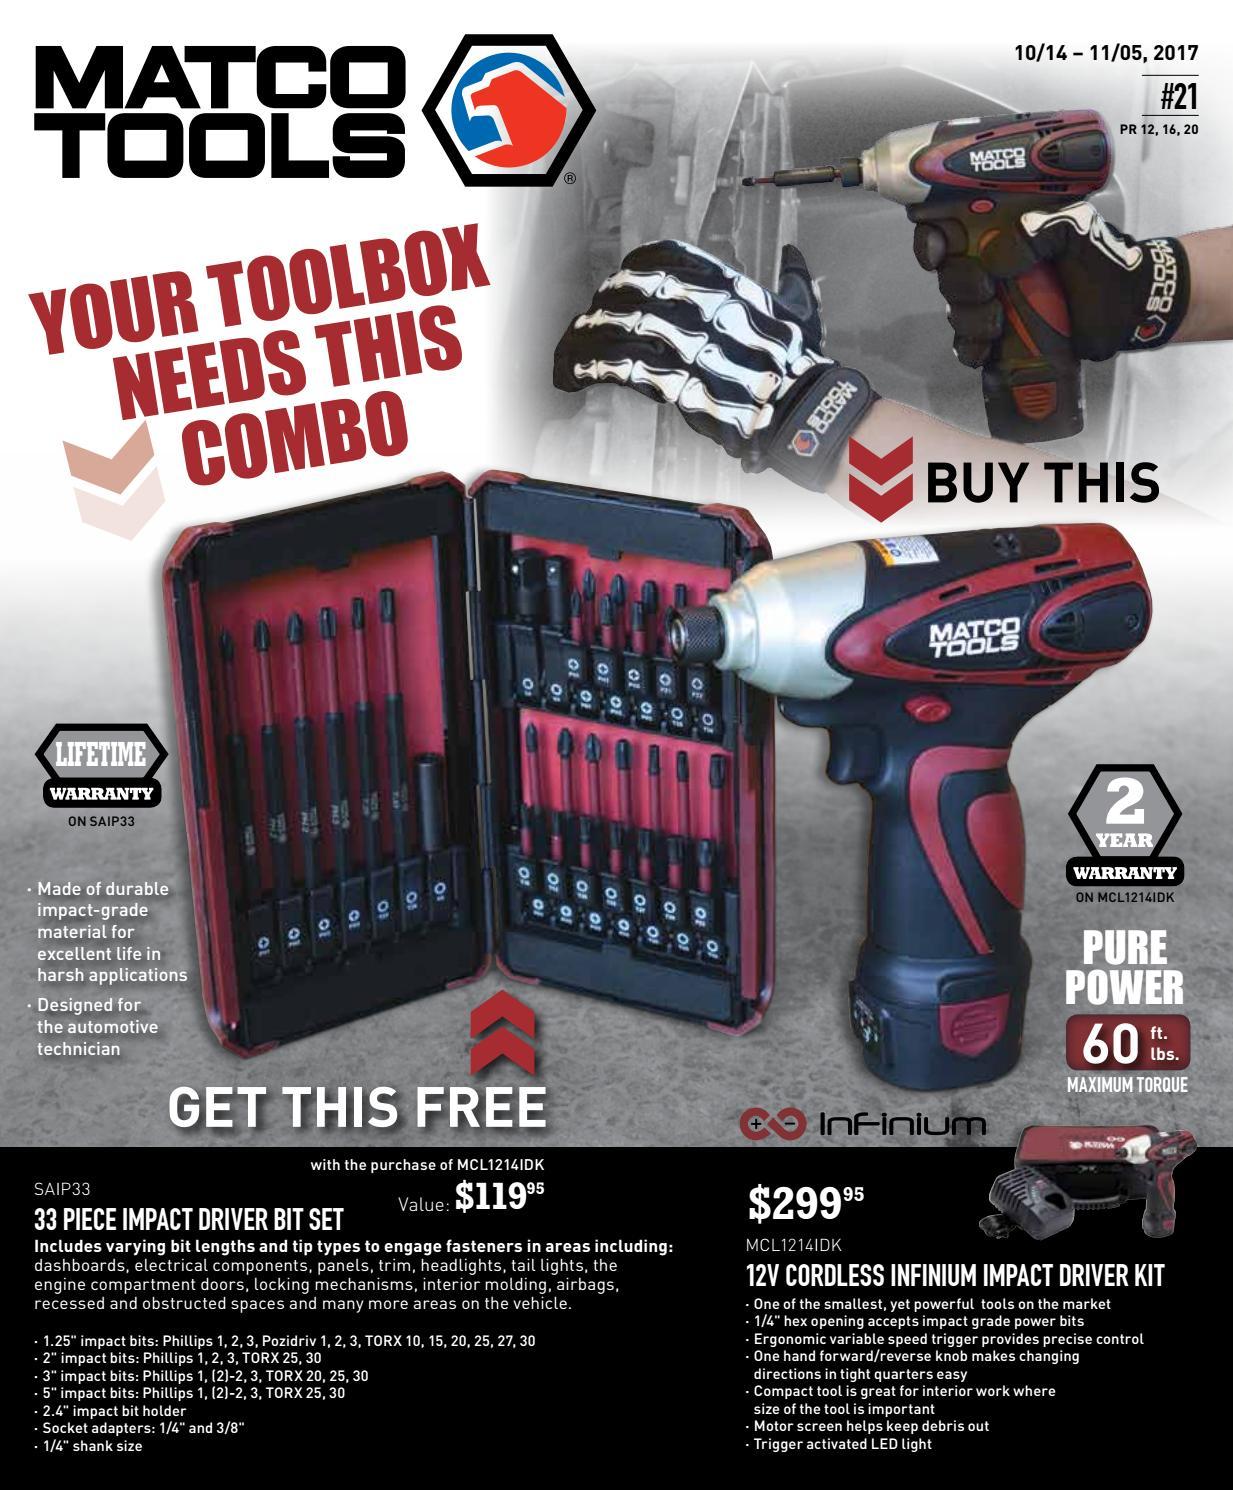 Matco Tools Flyer #21 by Dean Austin - issuu